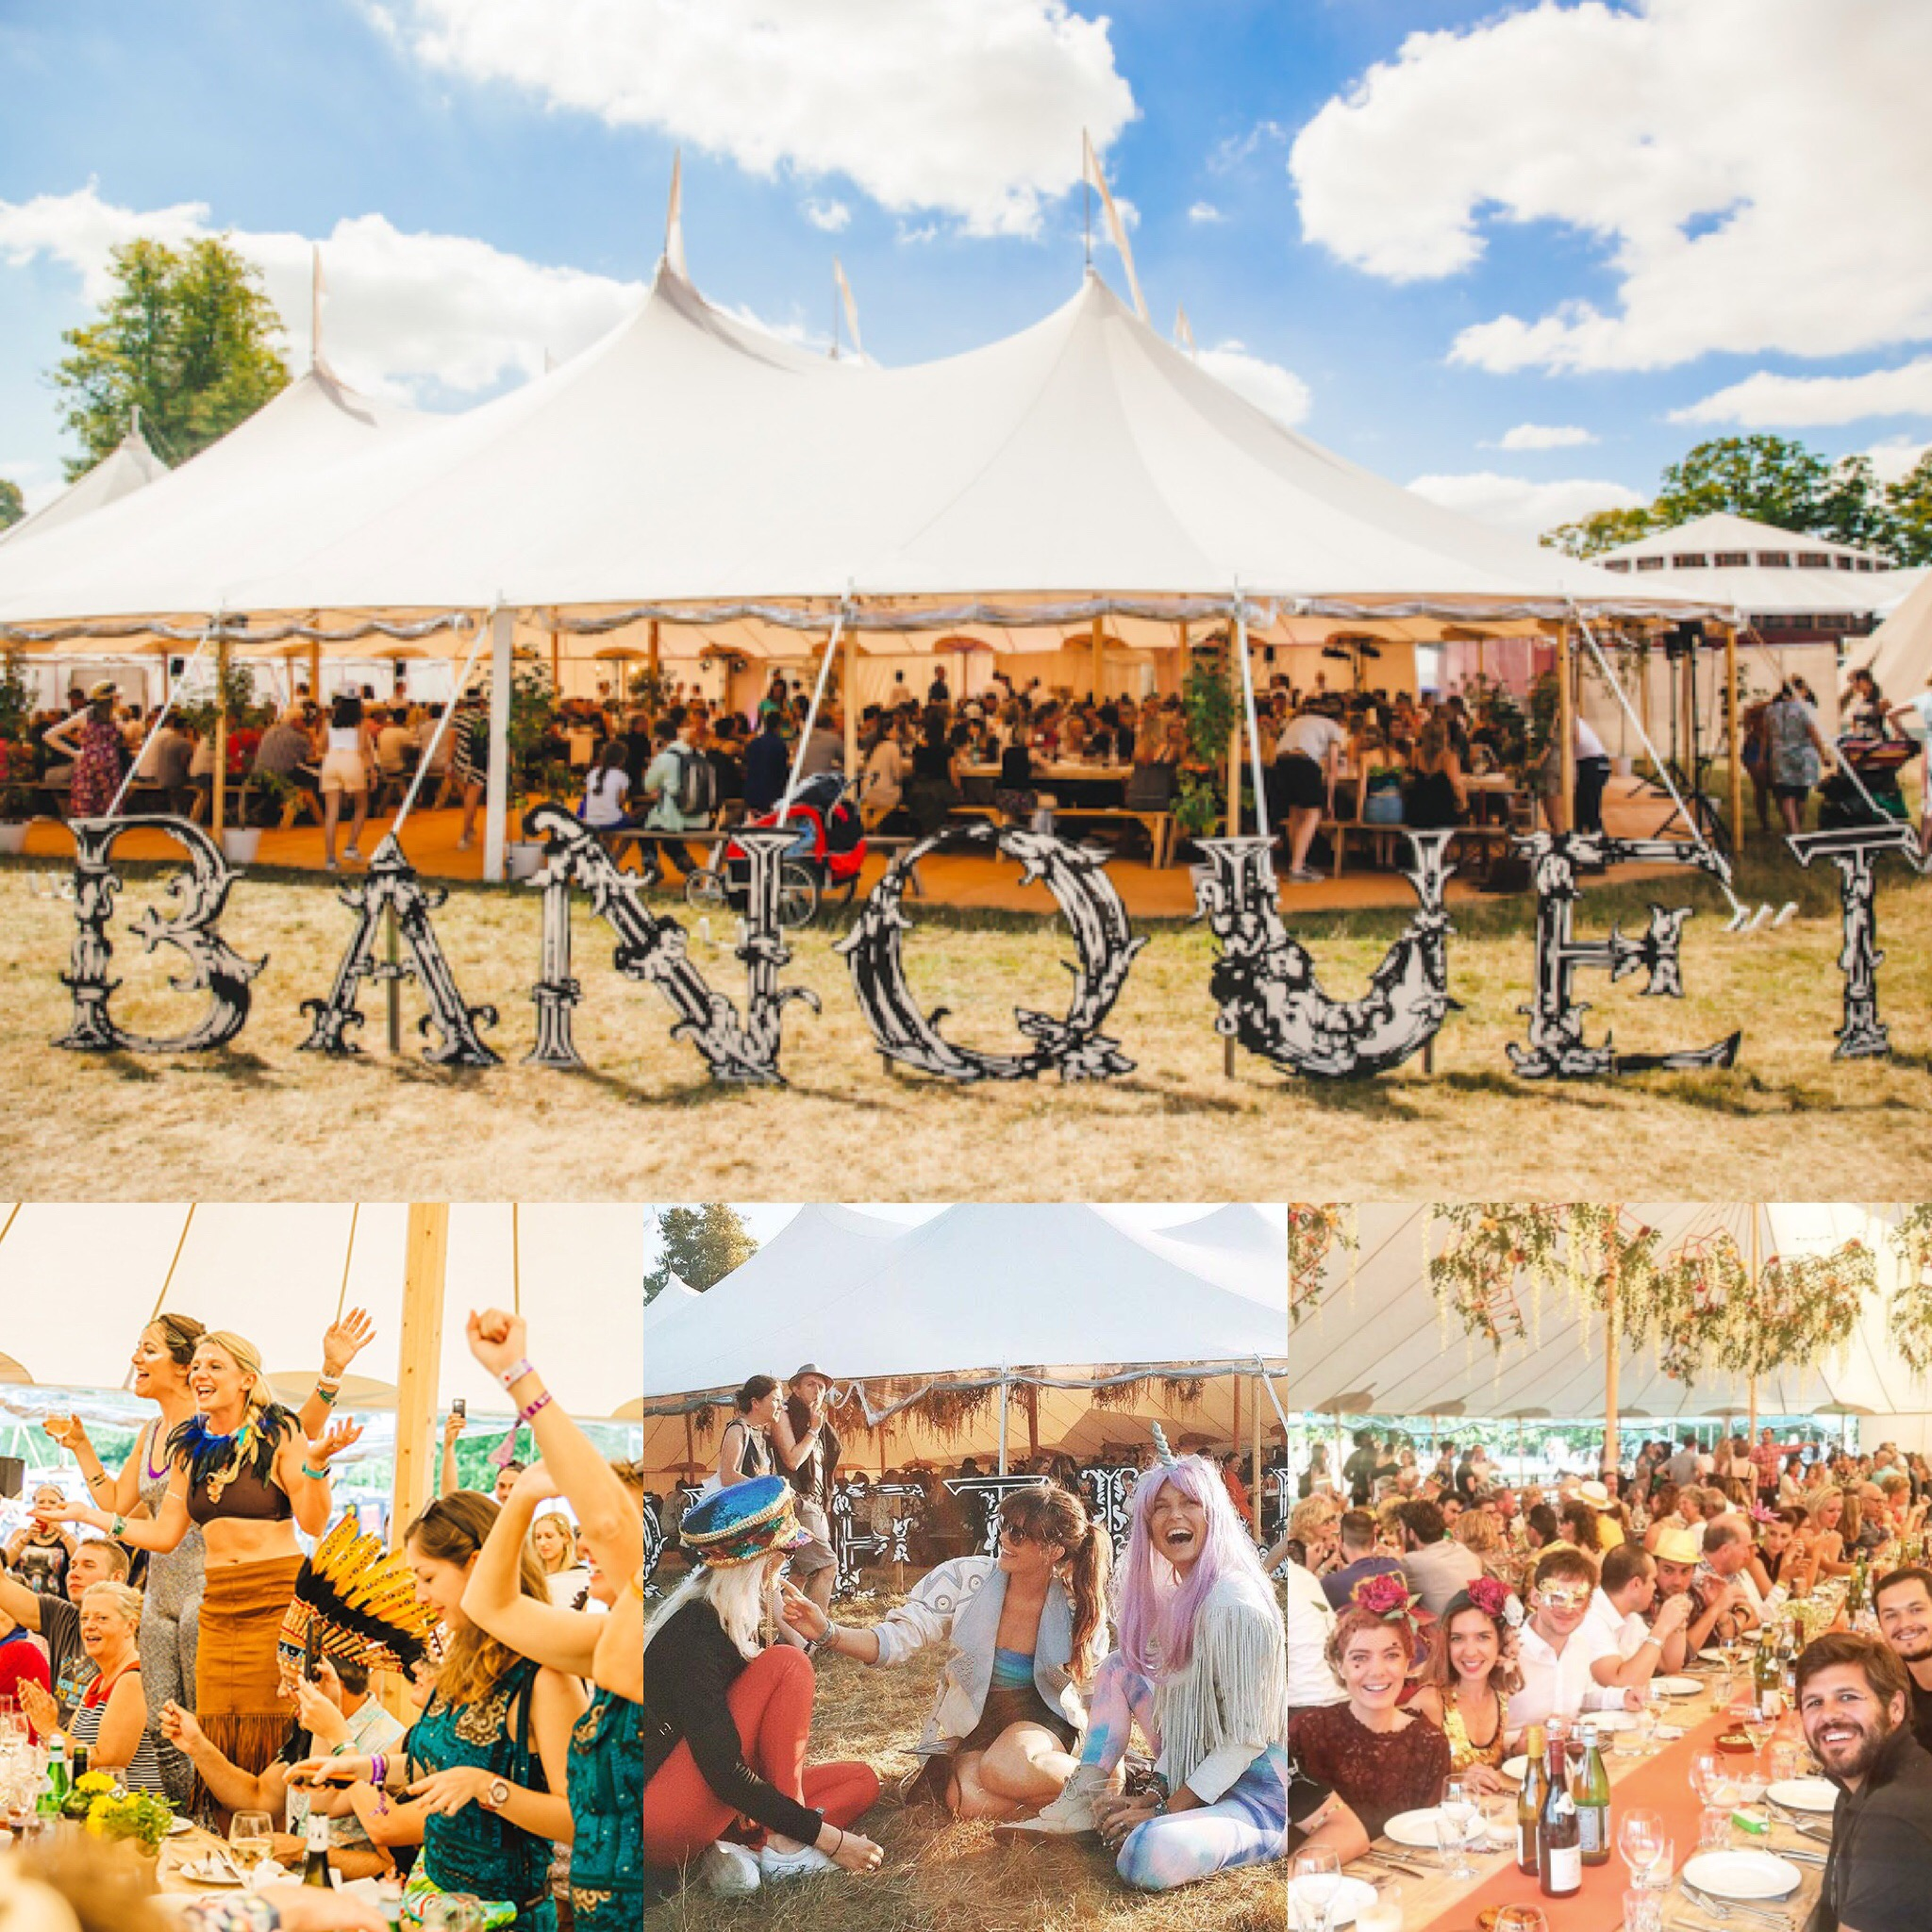 PapaKåta Sperry Tent at Wilderness Festival